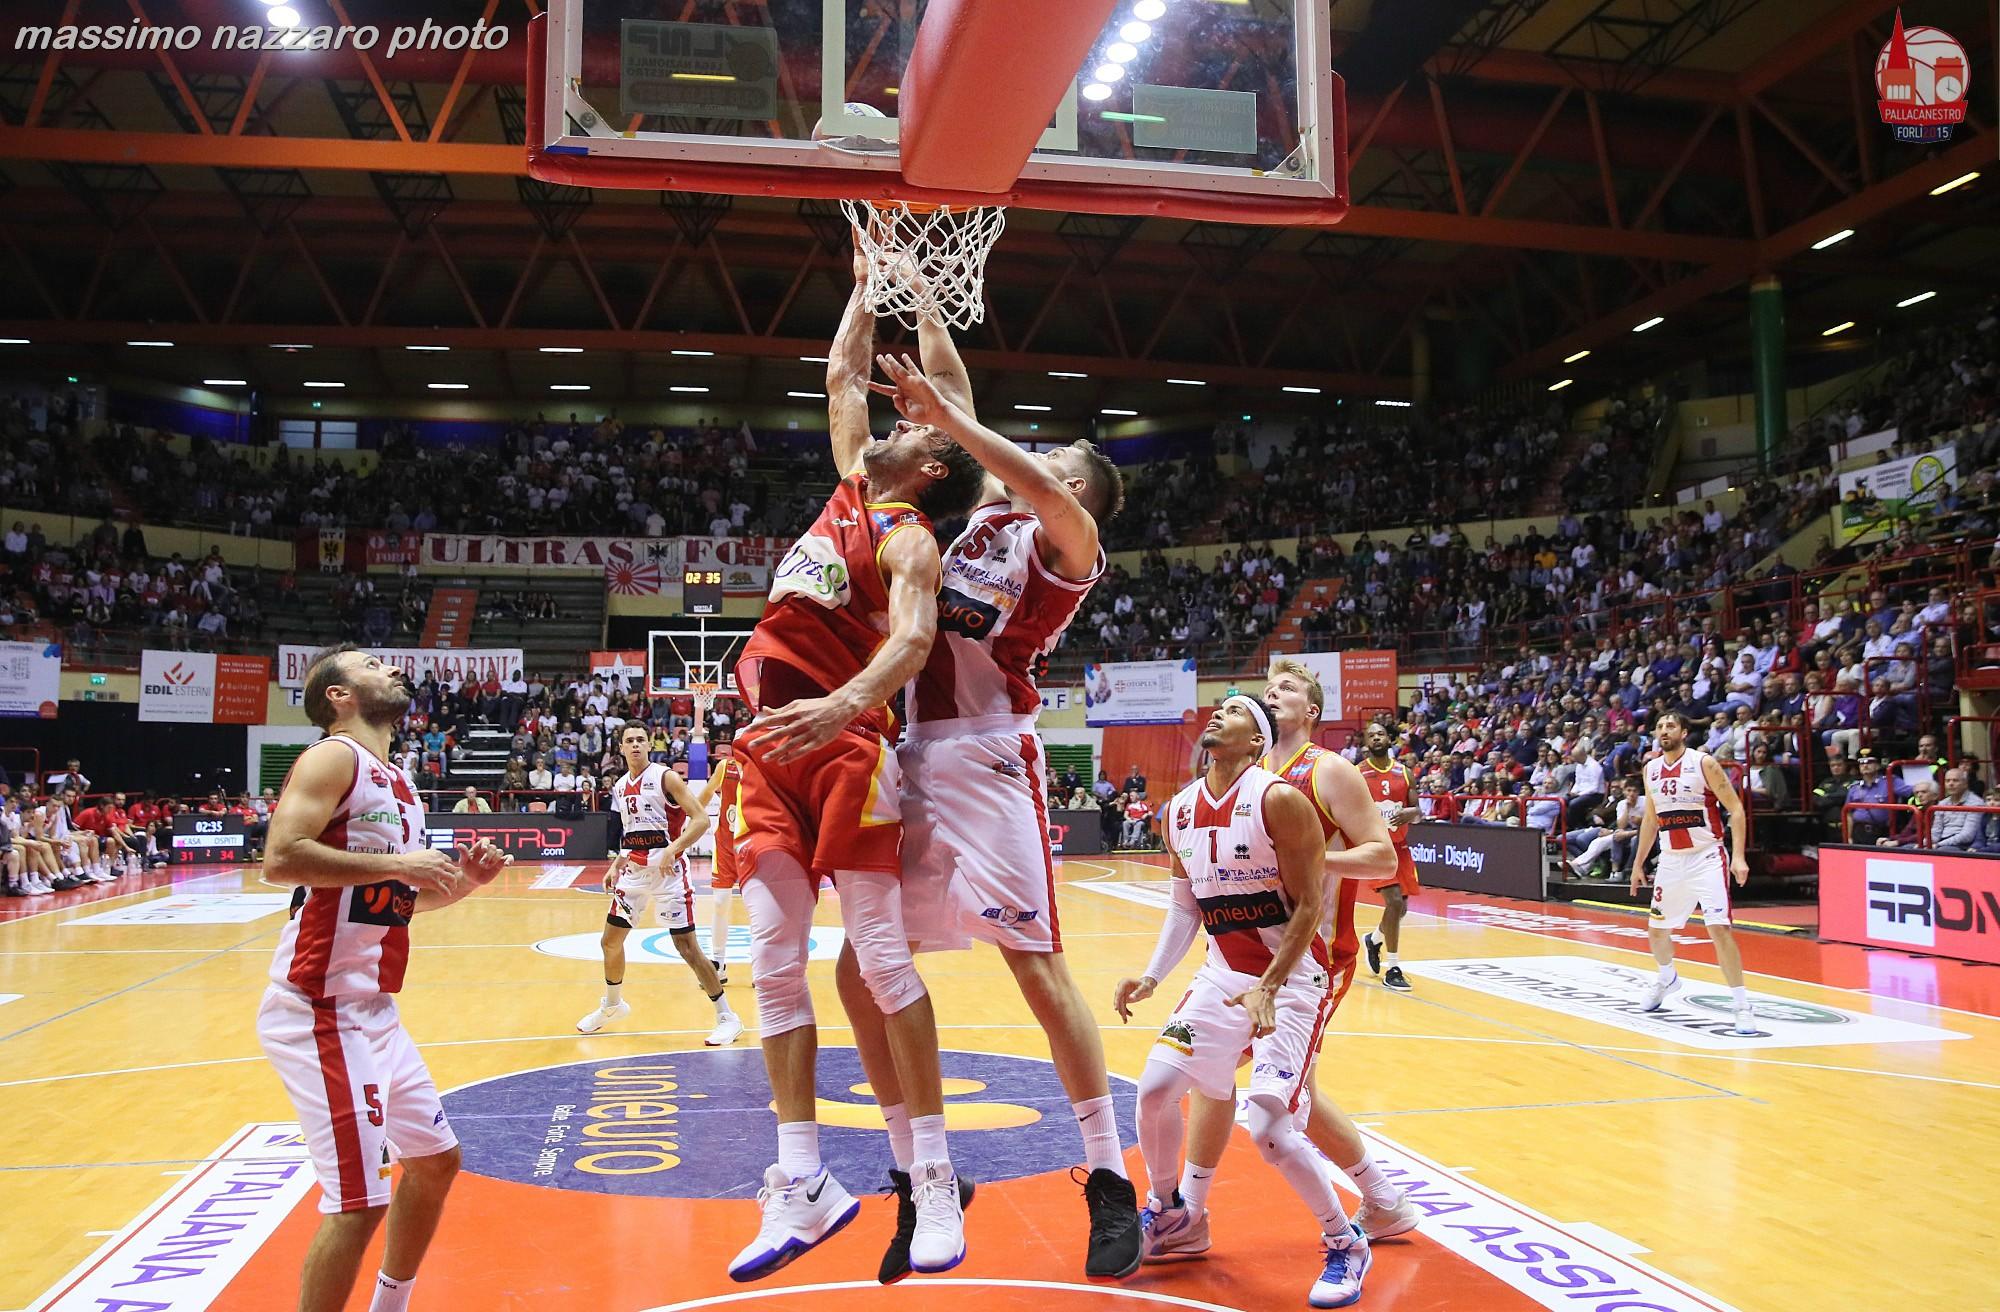 Basket-Forlì-Ravenna